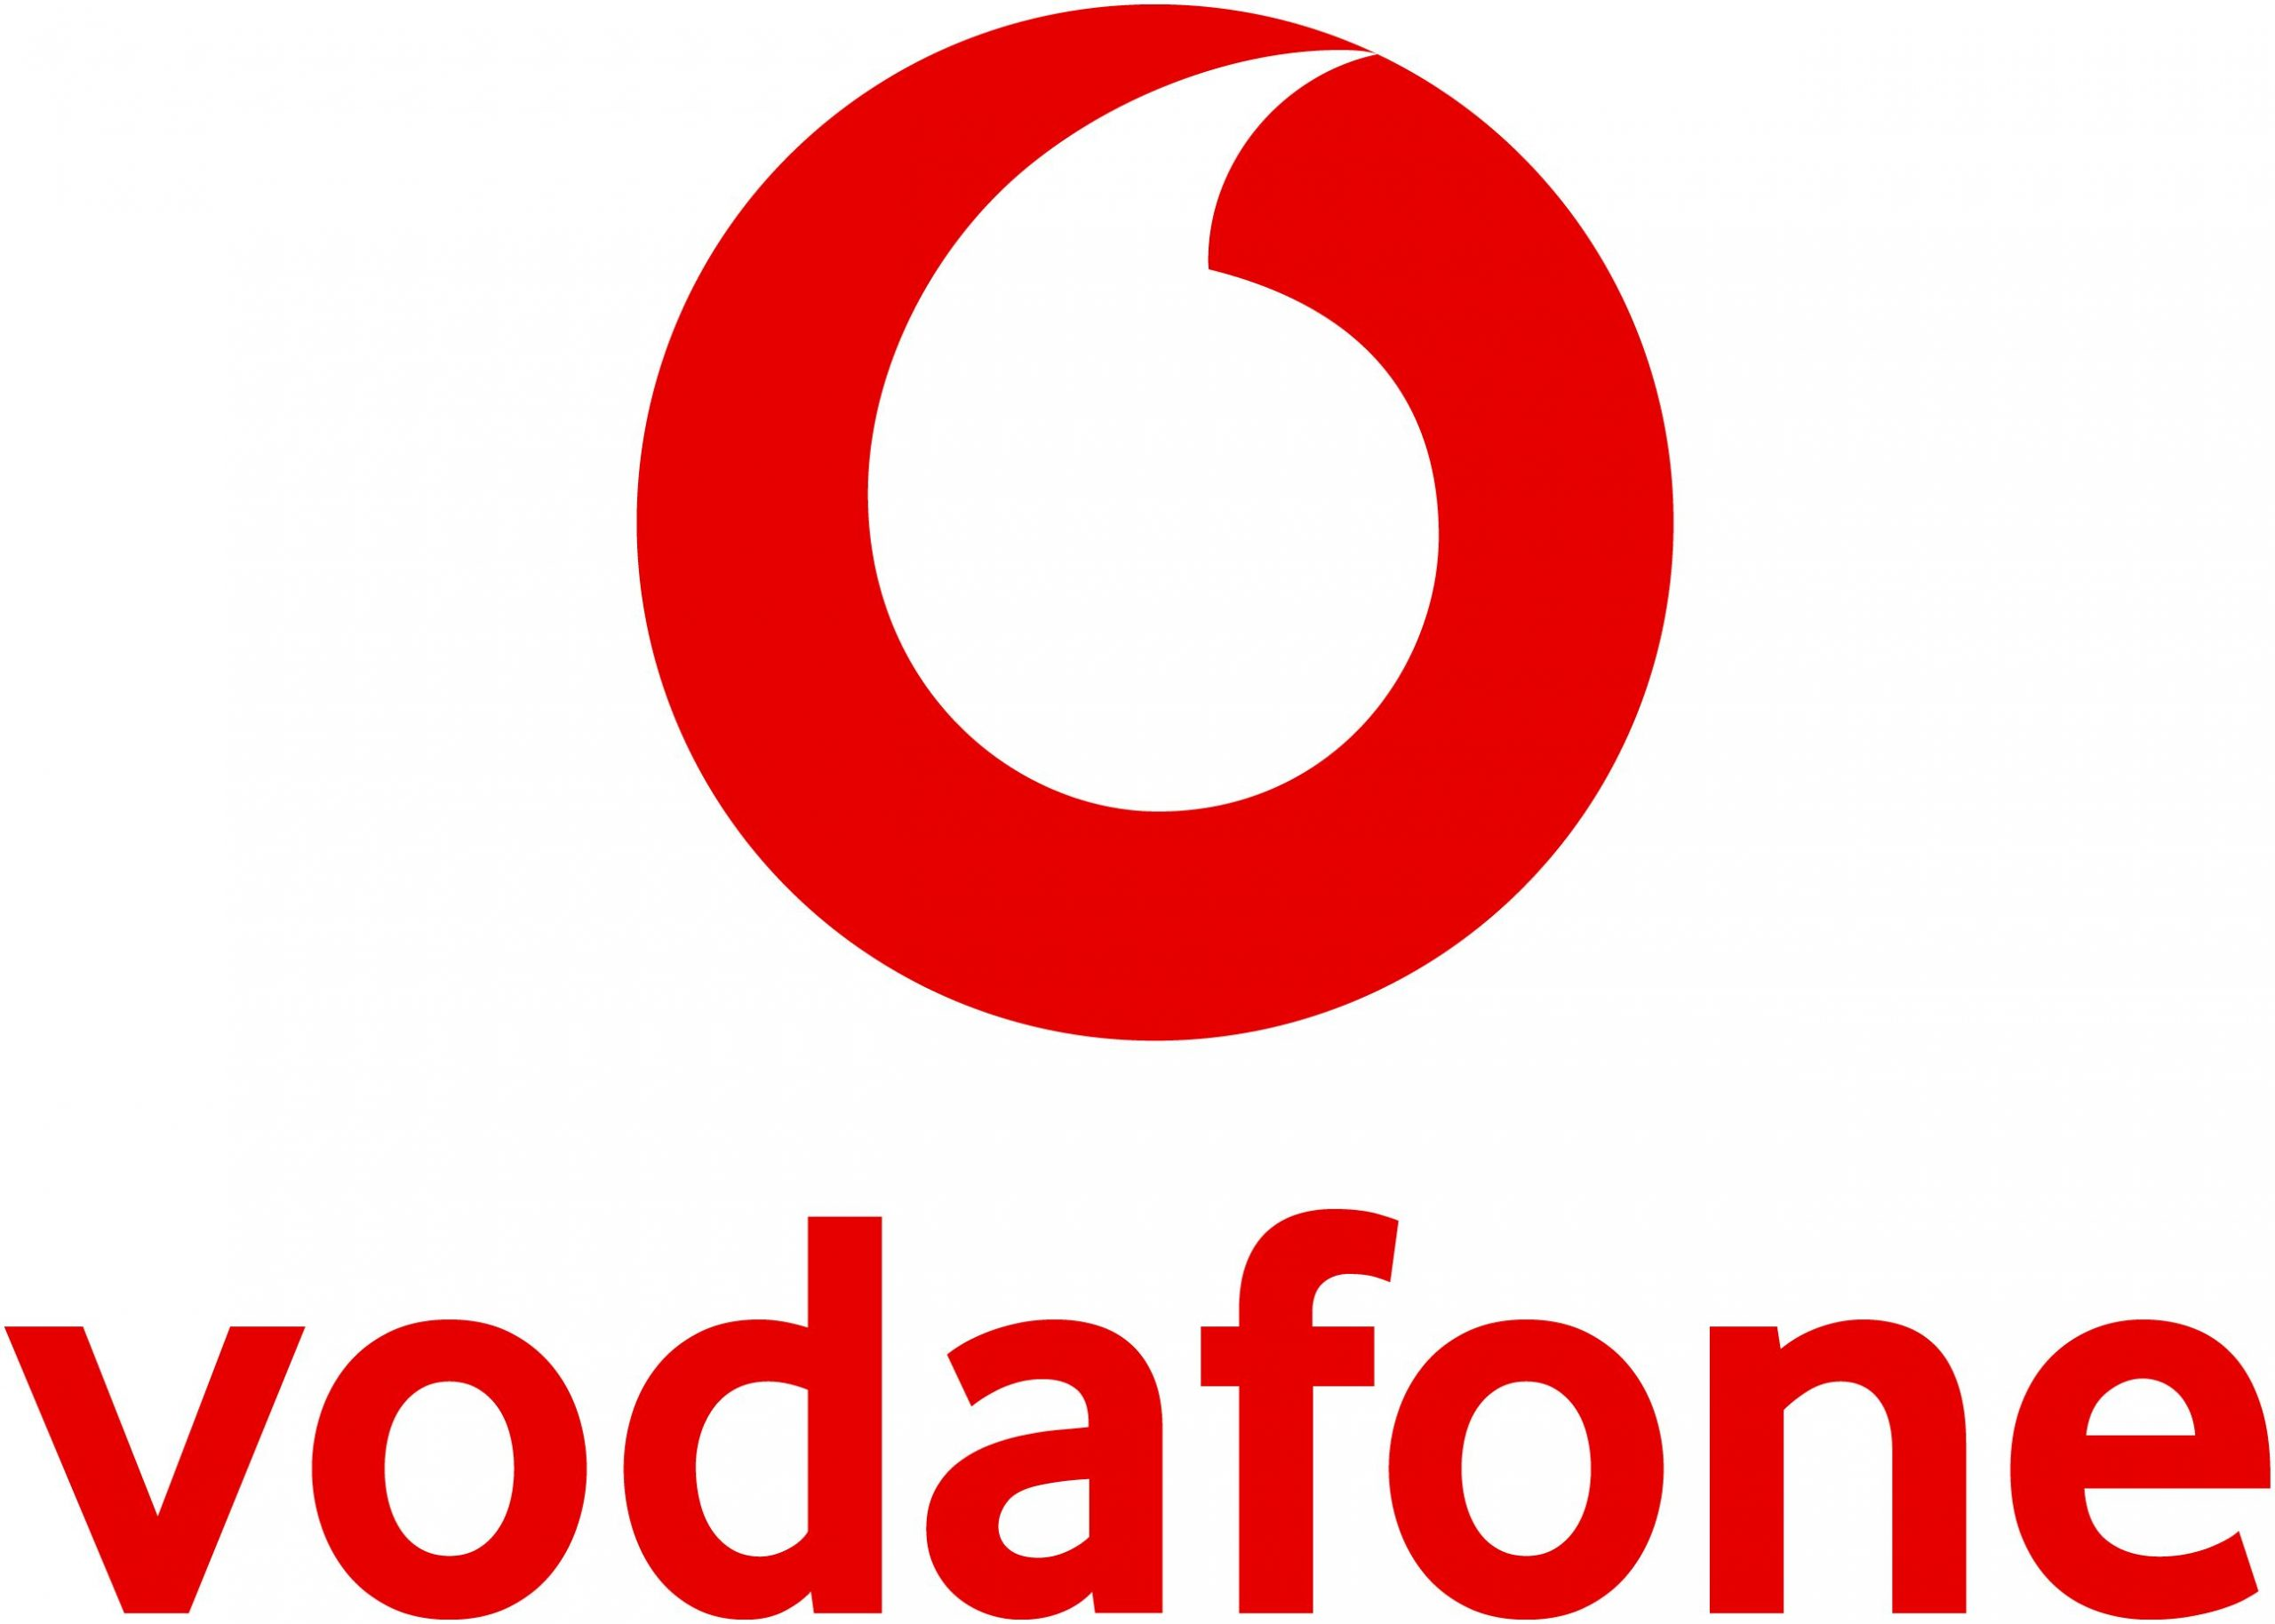 Vodafone Hessen GmbH & Co. KG